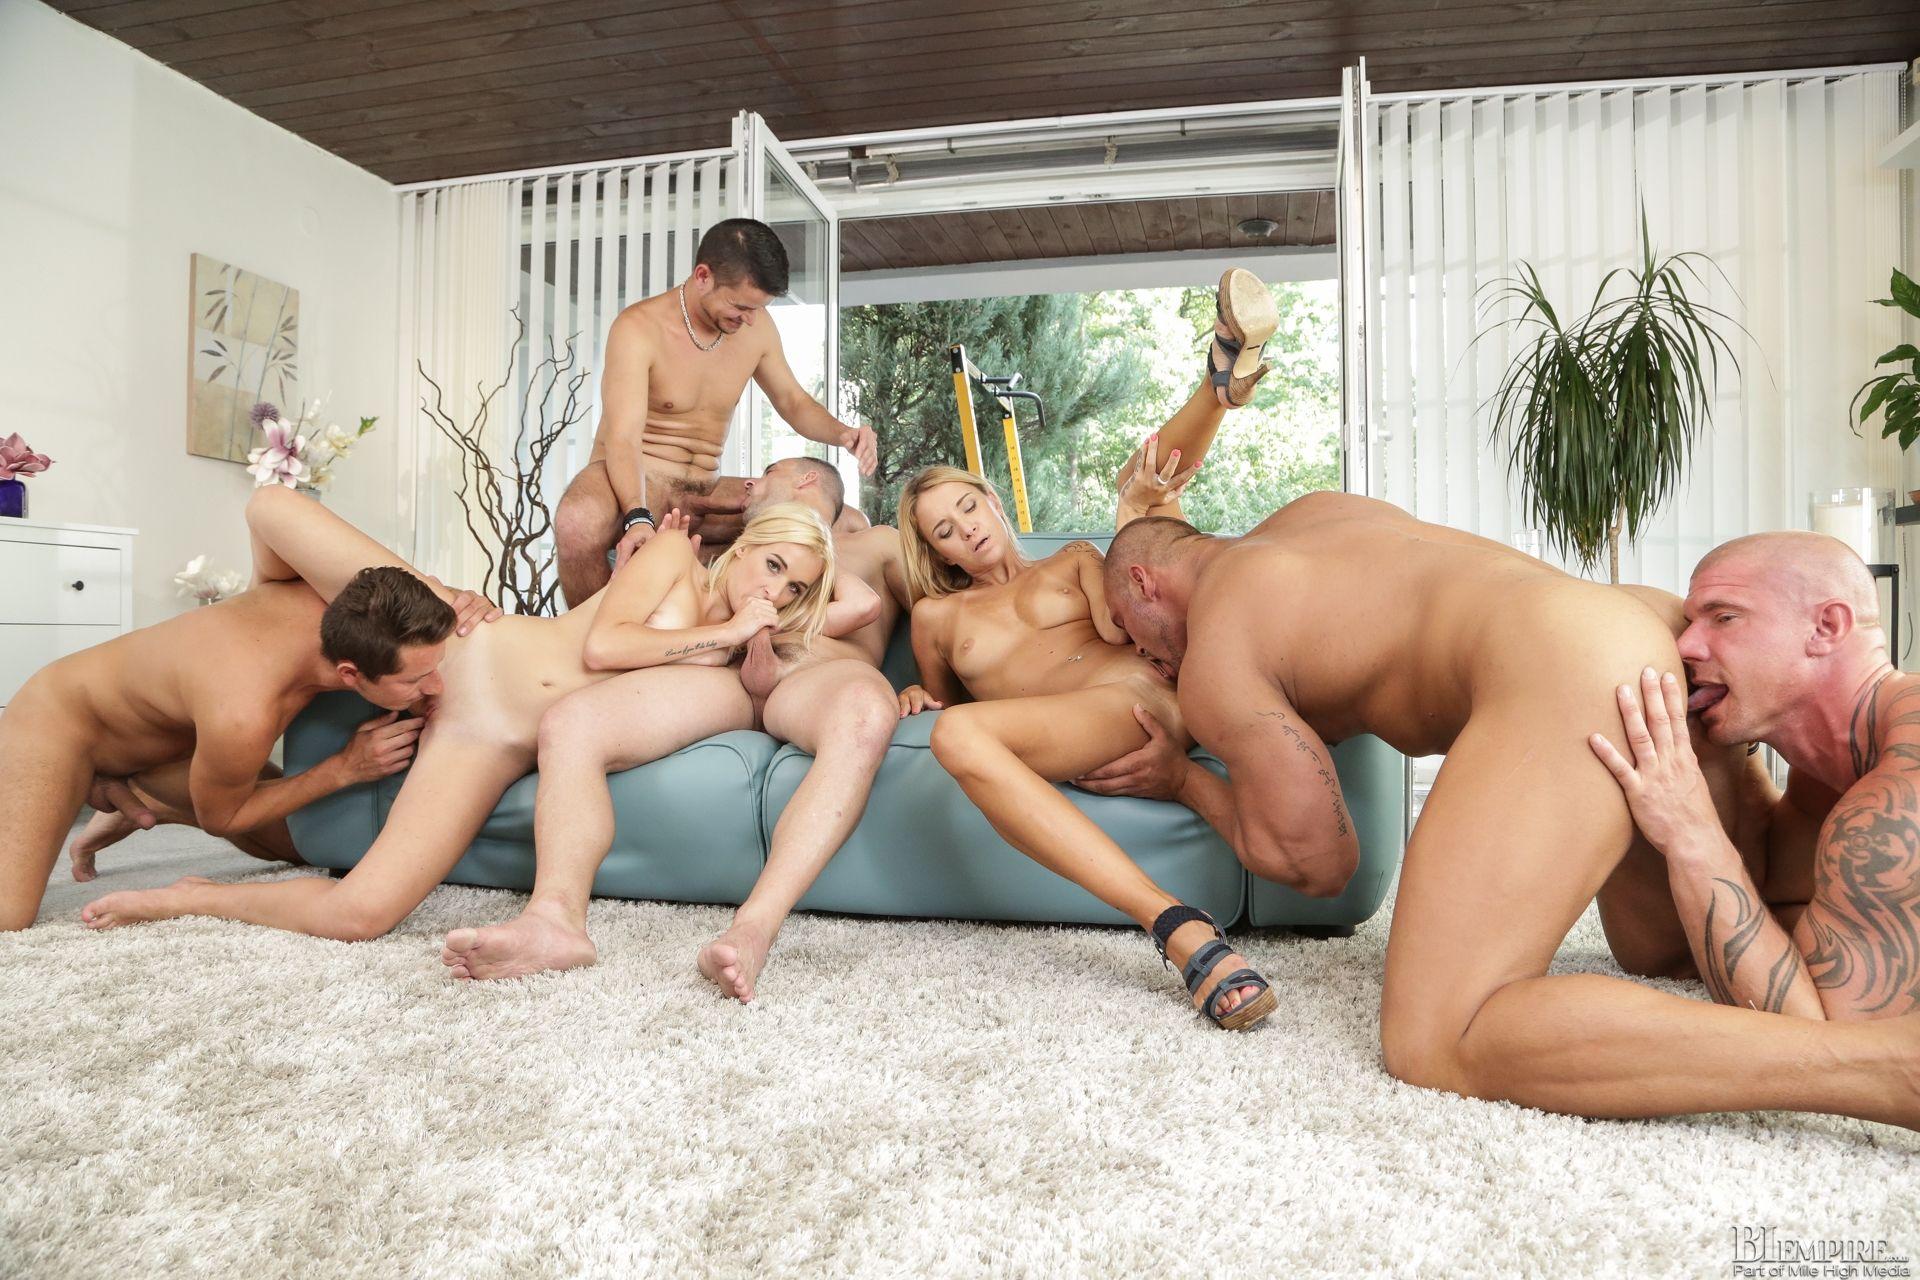 Bisexual orgy tgp